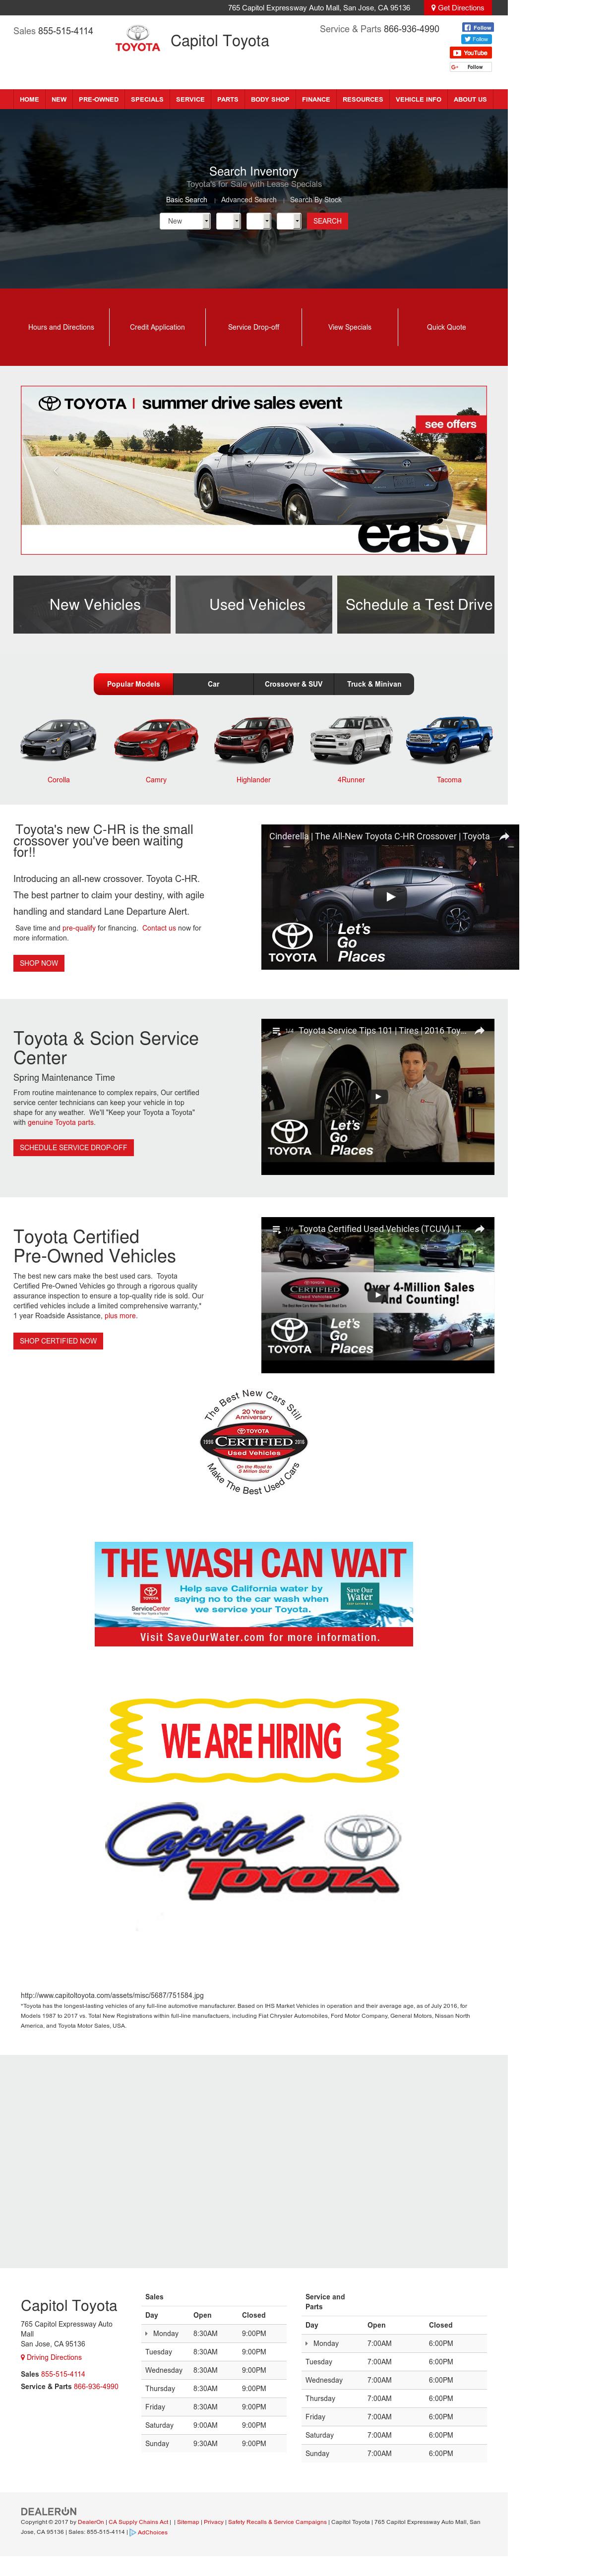 Capitol Toyota Scion Website History